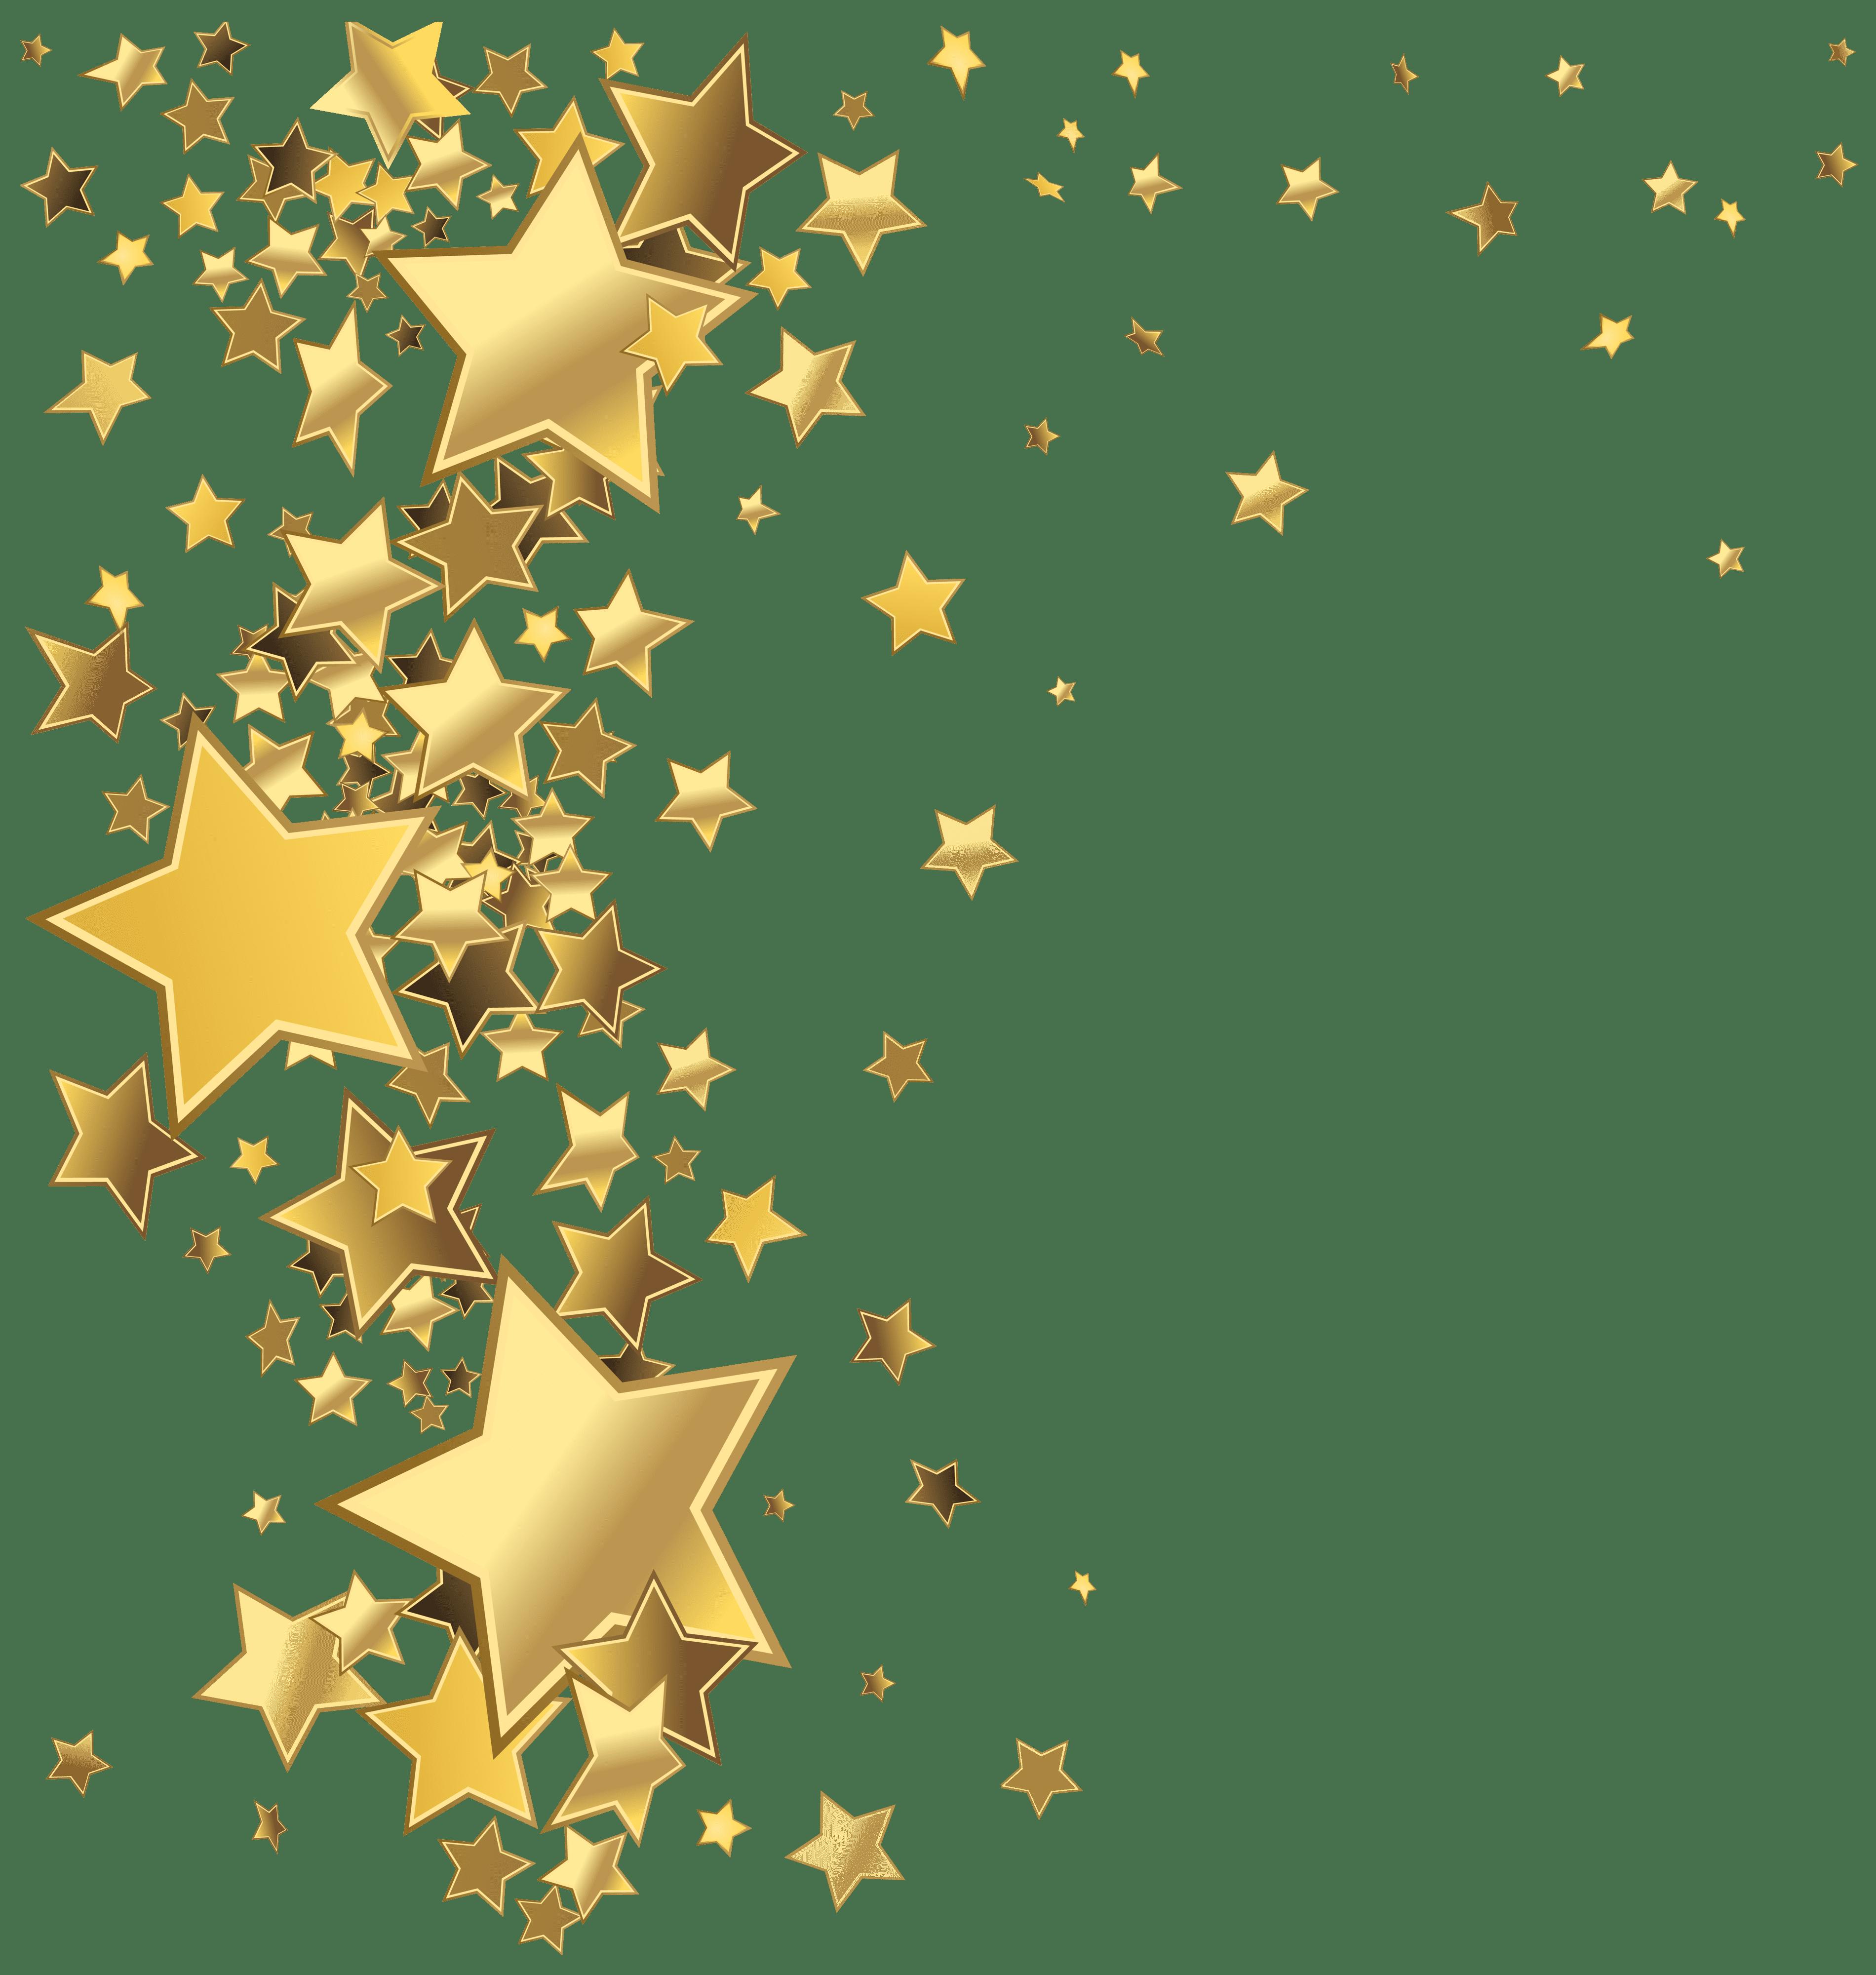 Stars Decoration PNG Clip Art Image.